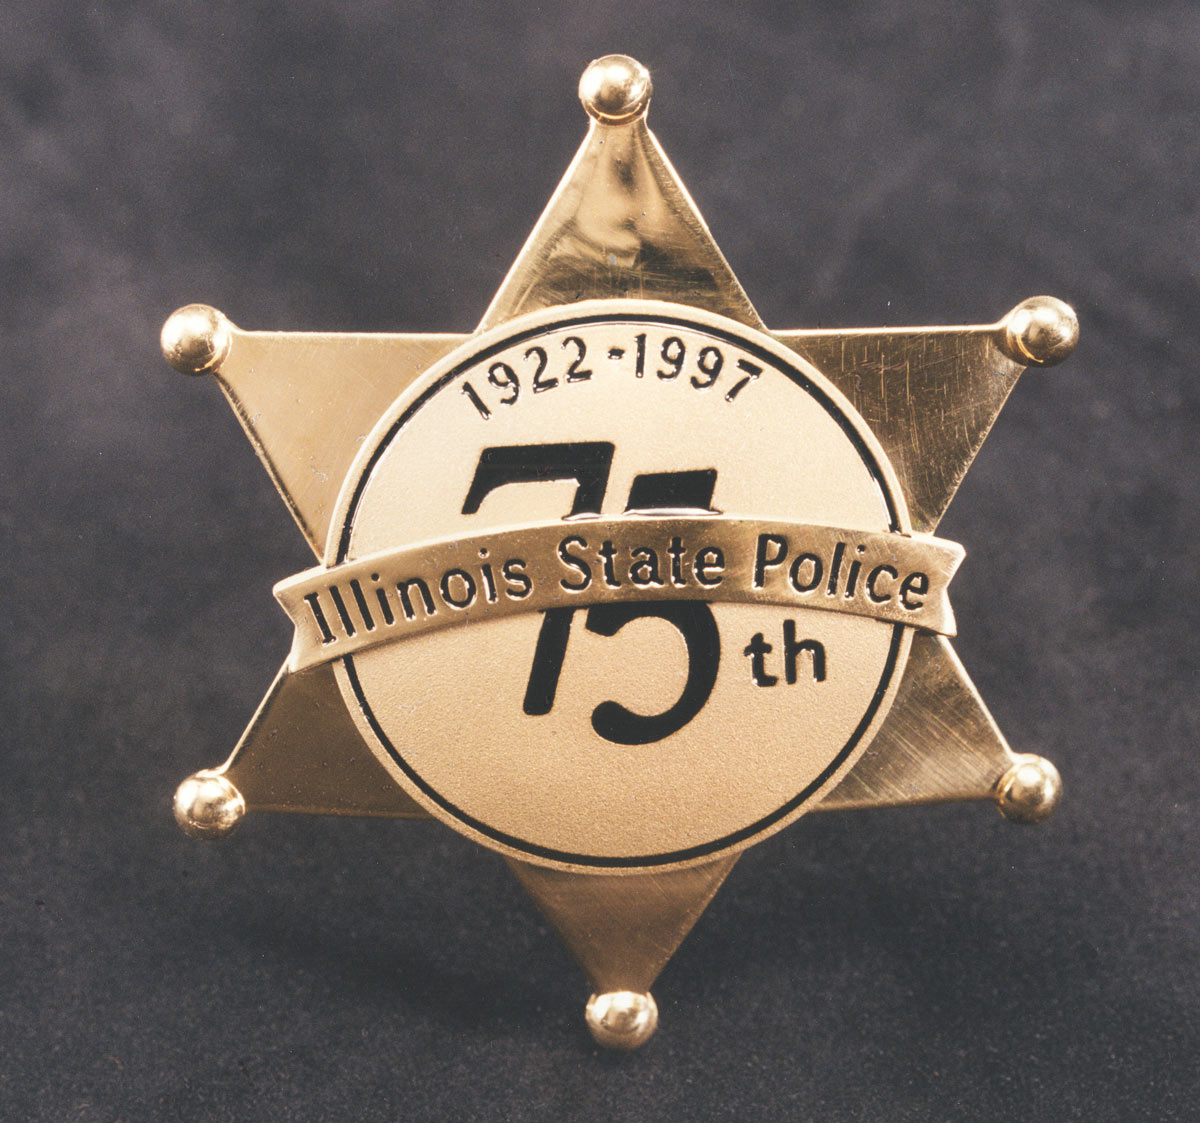 75th Anniversary star